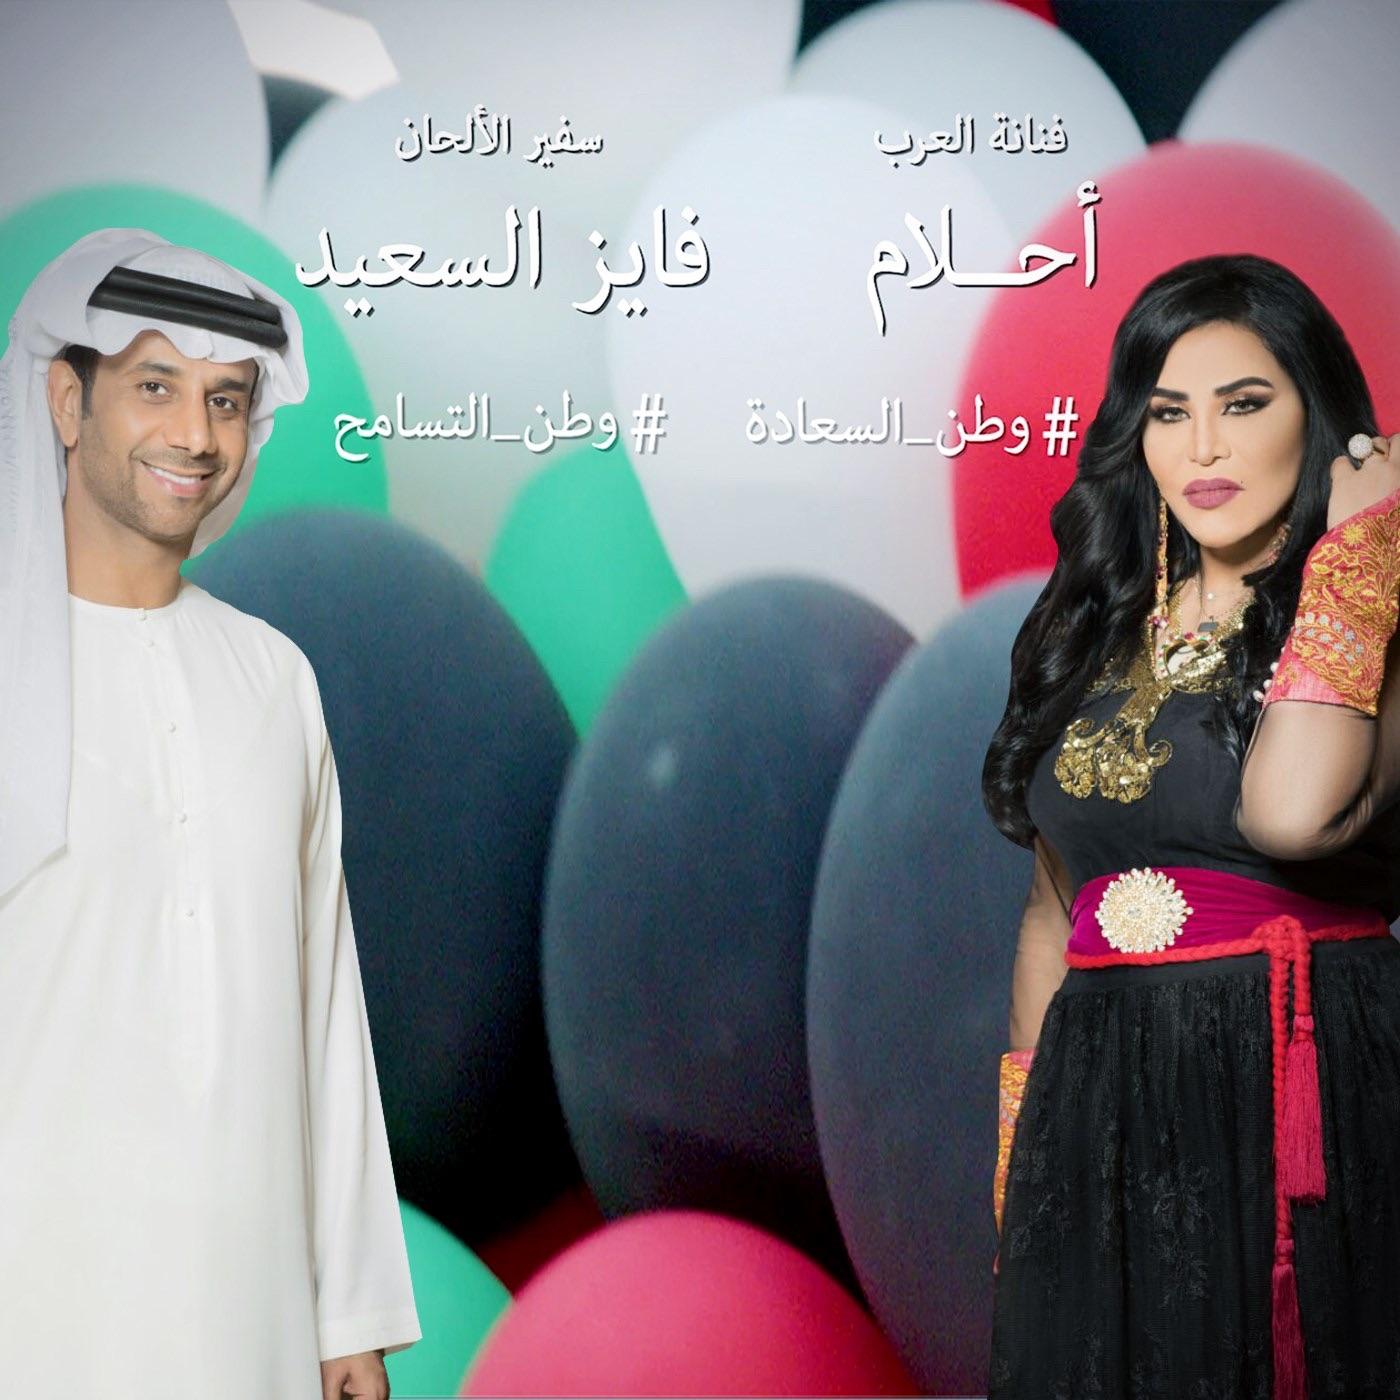 Watan Al Saadah - Watan Tsamoh - Single